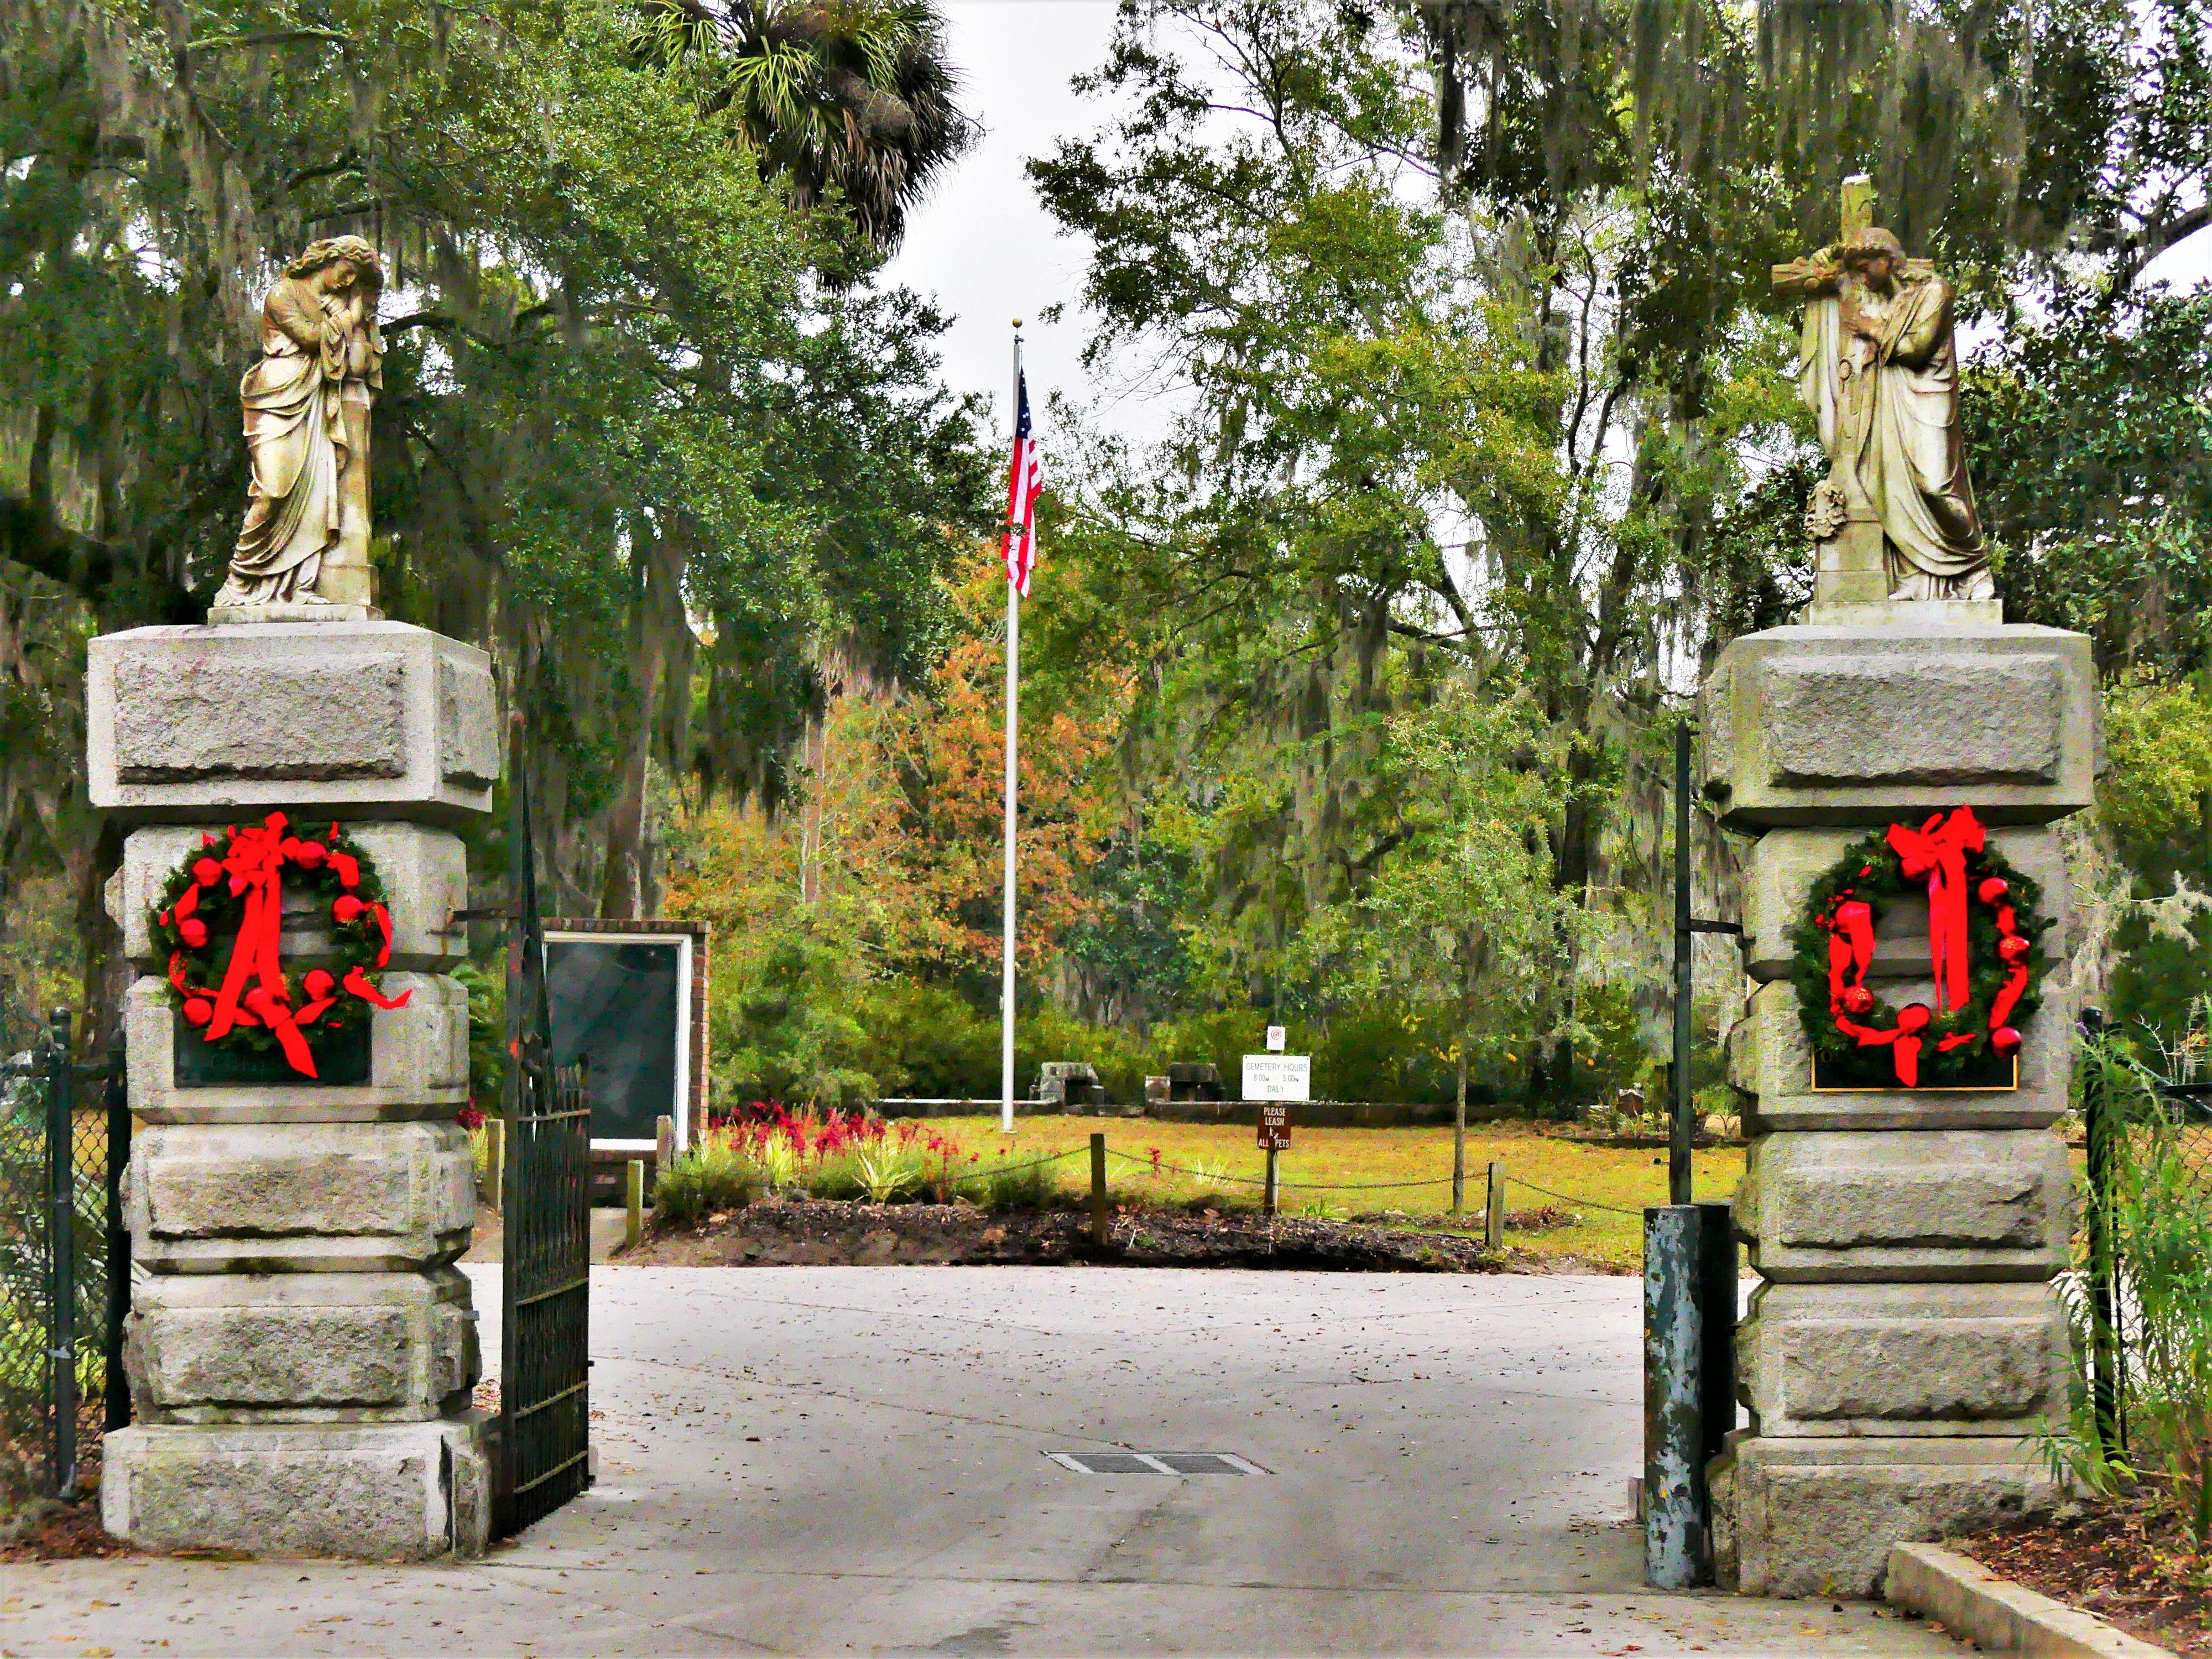 Christian entrance